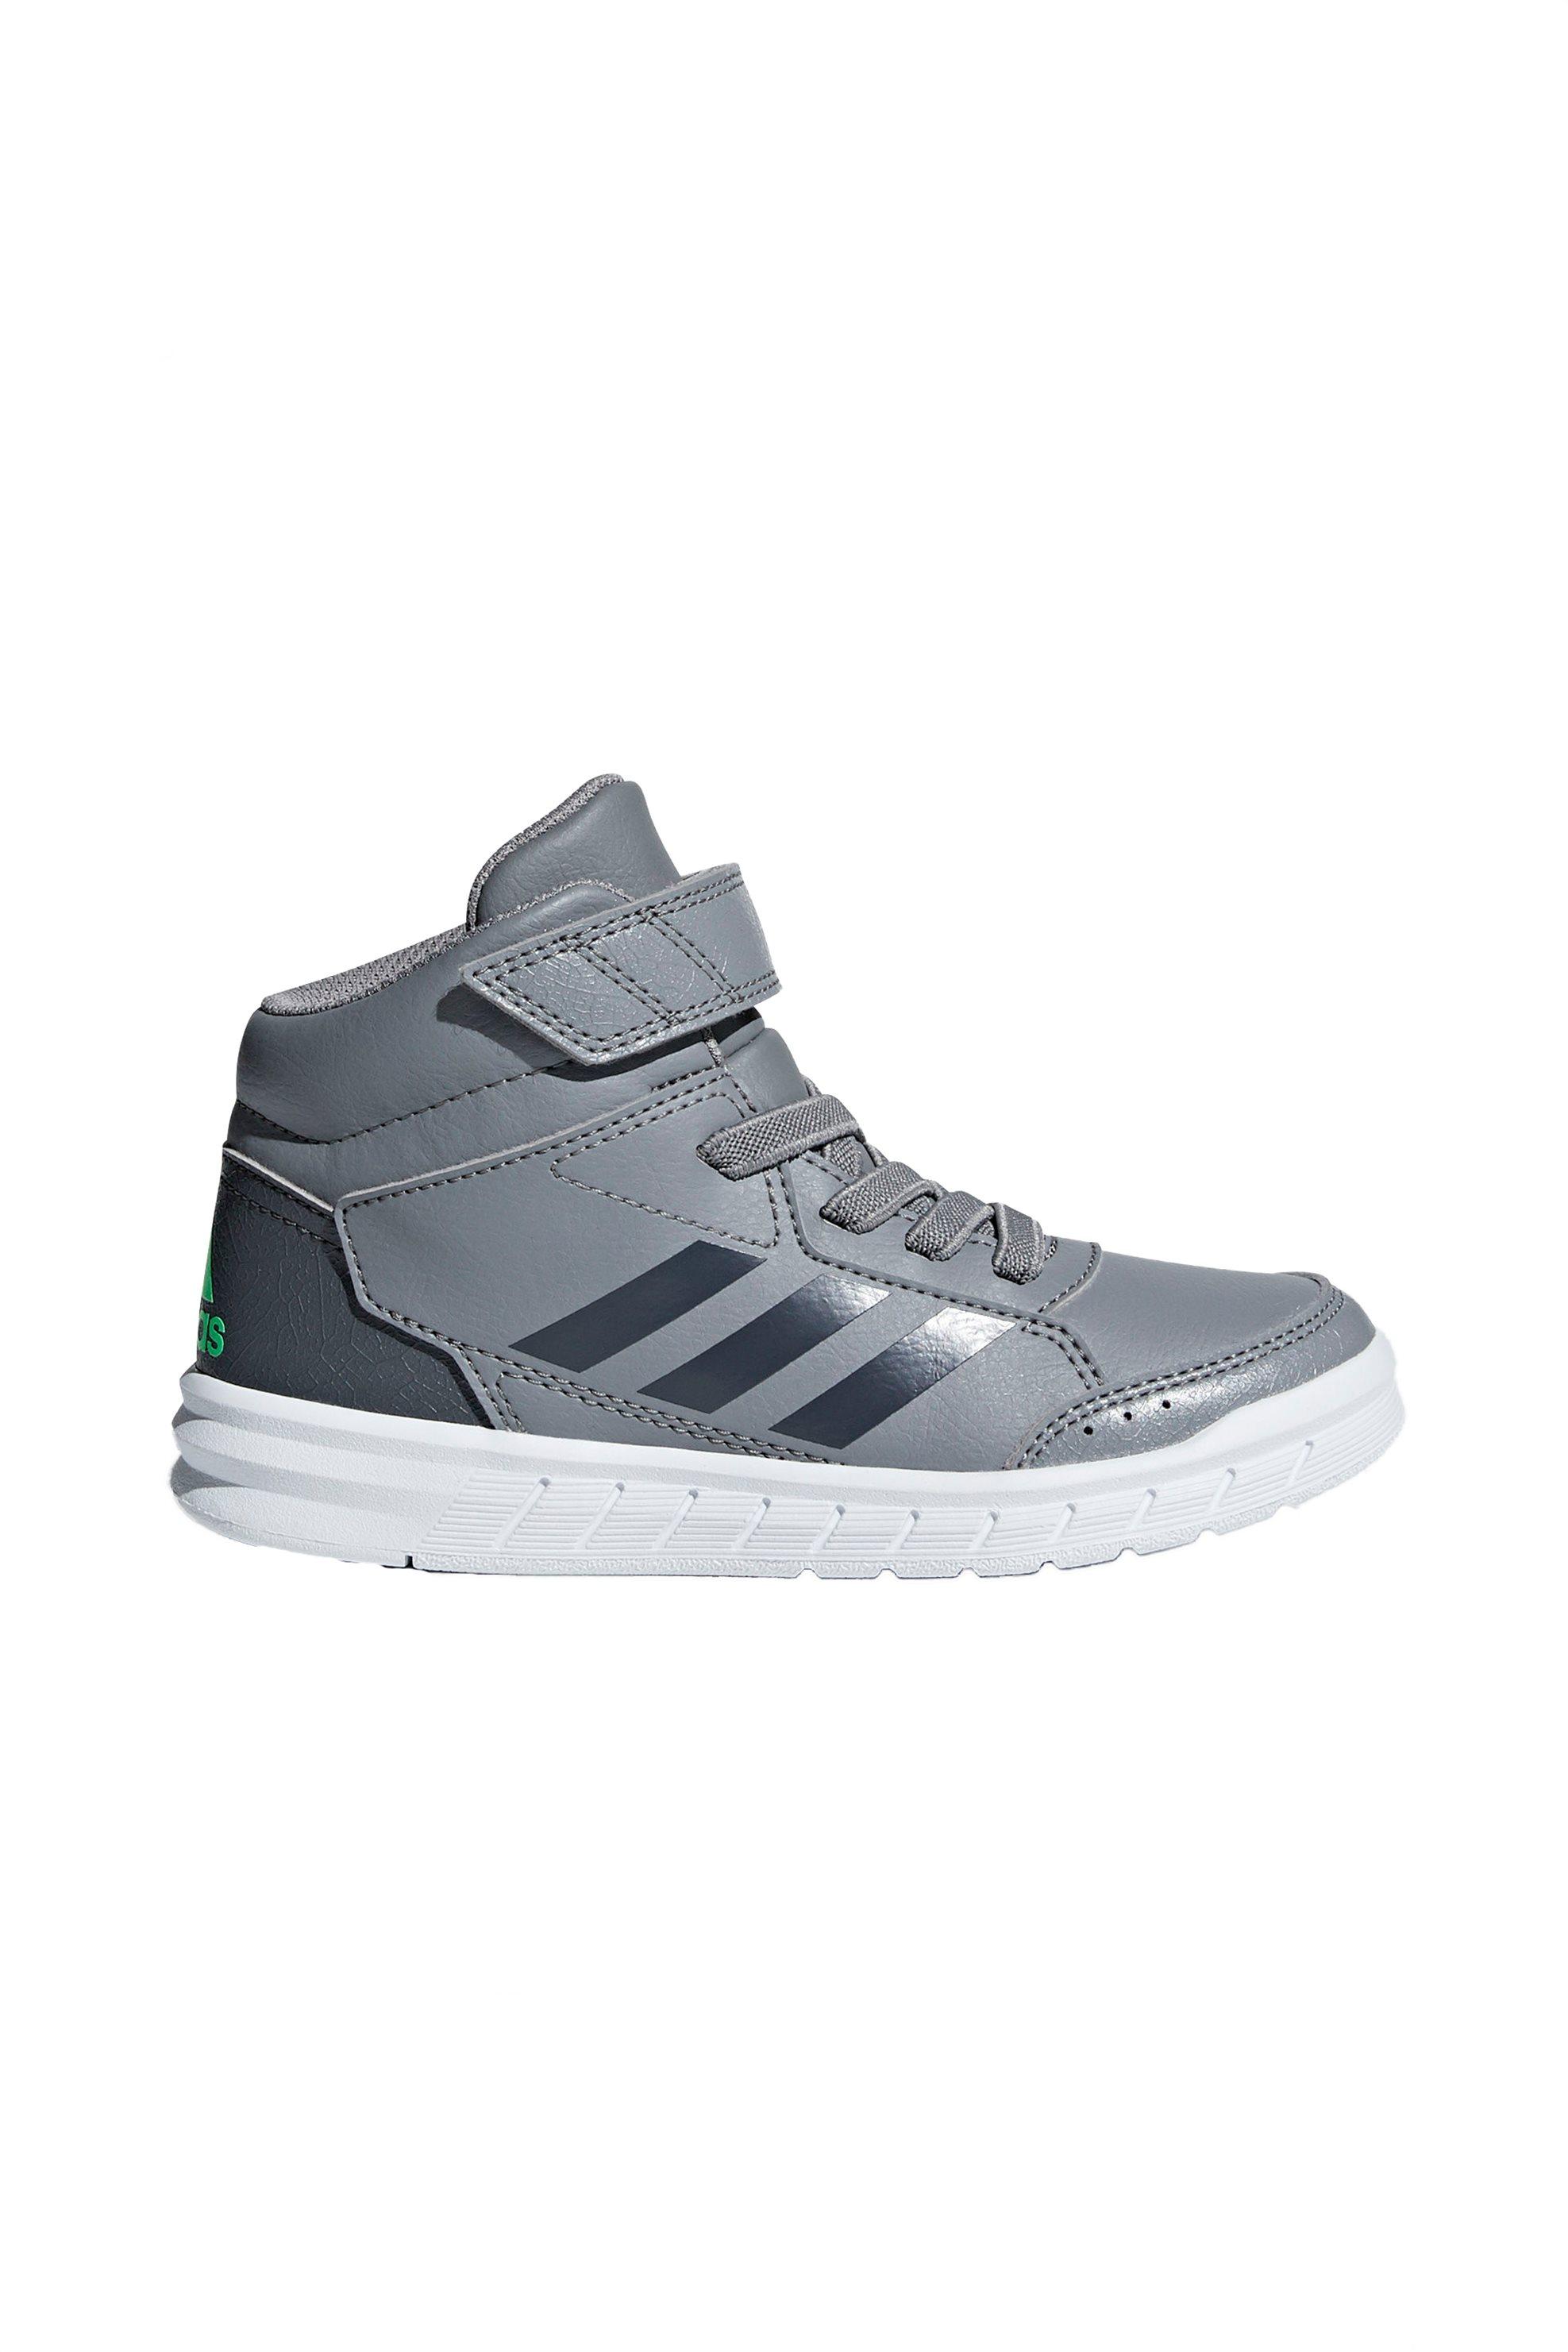 -30% Notos Adidas παιδικά αθλητικά παπούτσια Altasport Mid EL K – AH2553 –  Γκρι 2e72c5b67ca